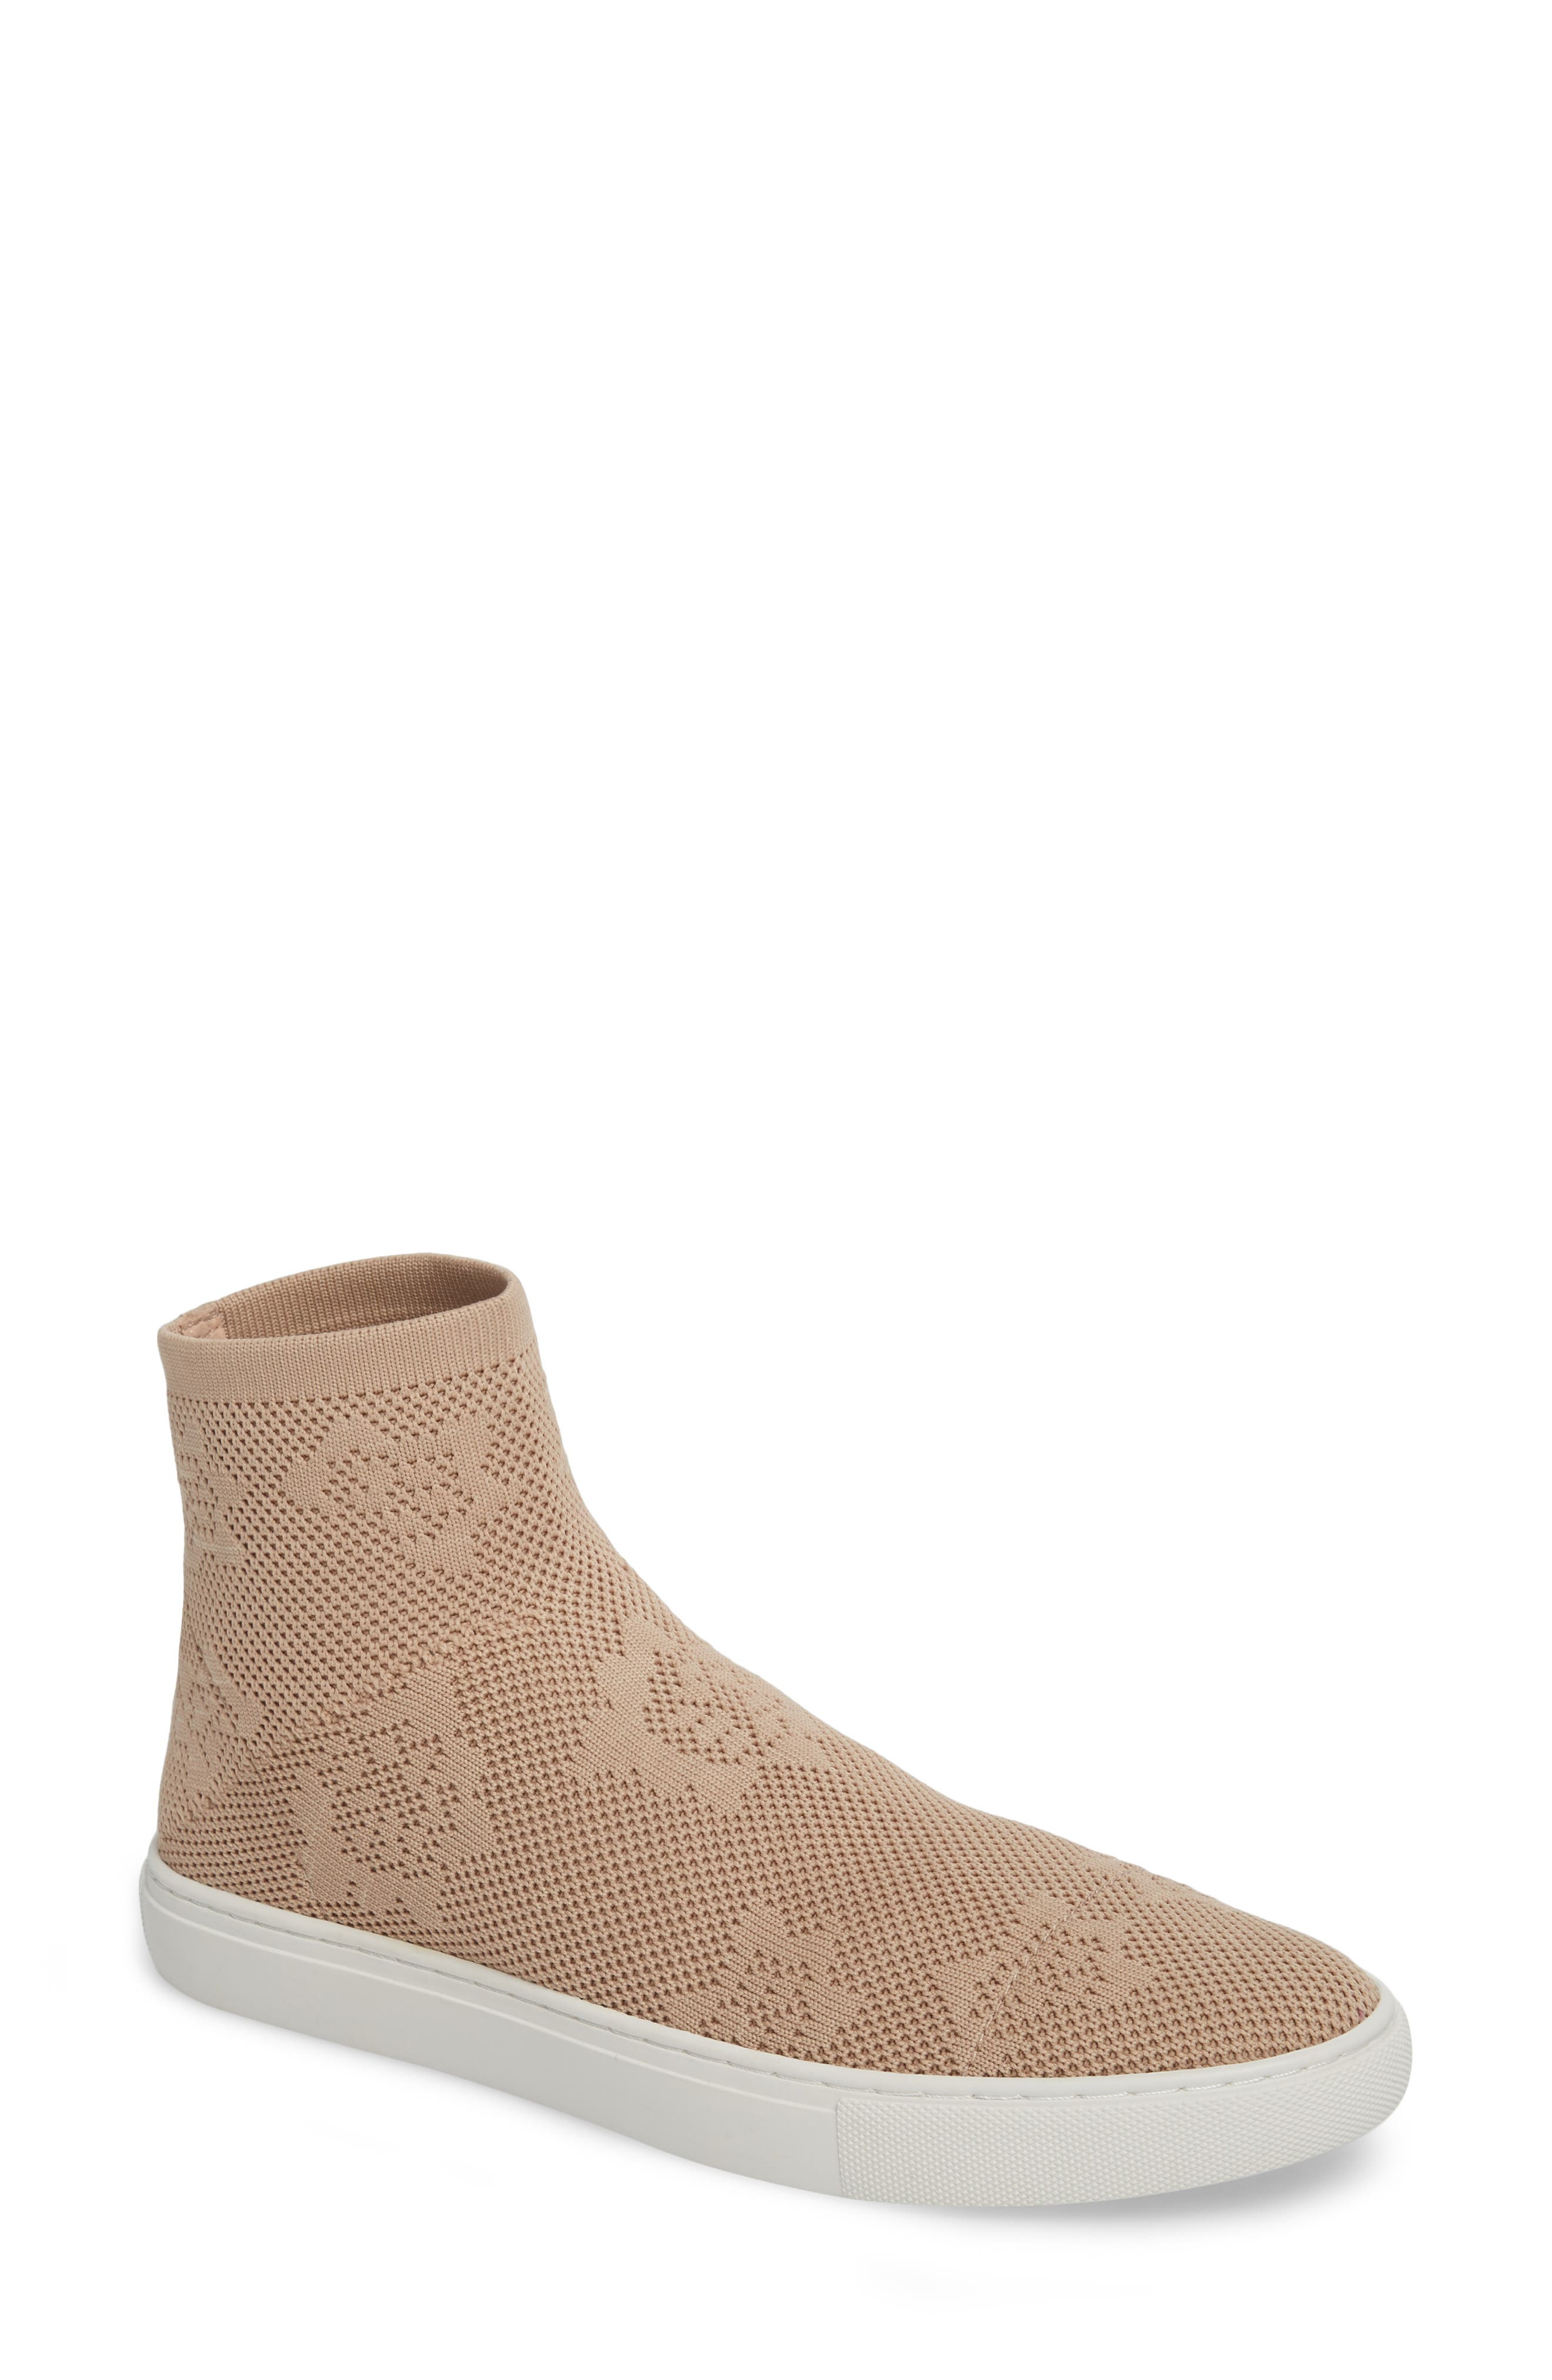 Keating Sneaker,                             Main thumbnail 3, color,